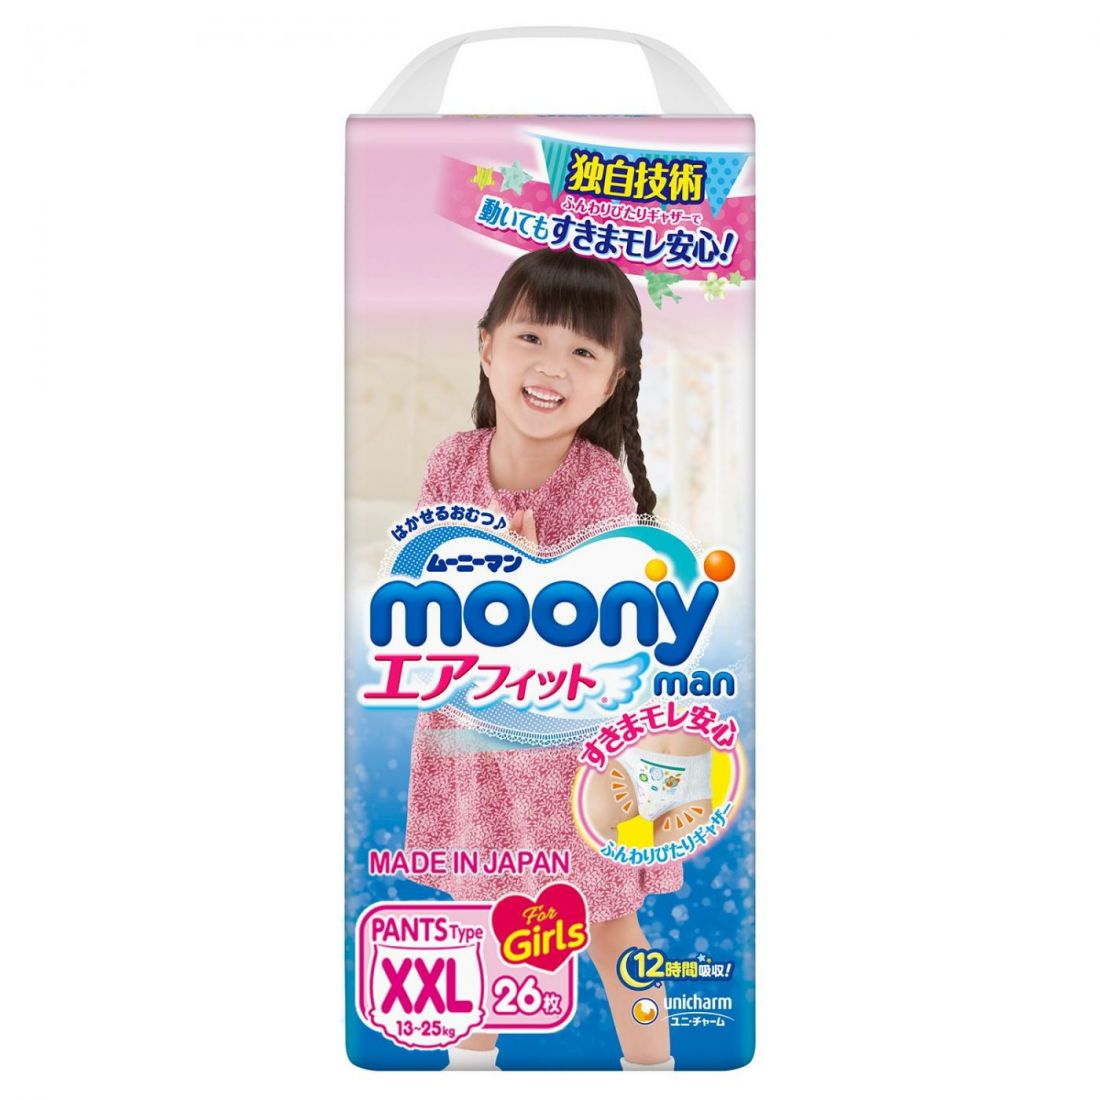 Moony Girl XXL 13-25 кг 26 шт, Подгузники-трусики